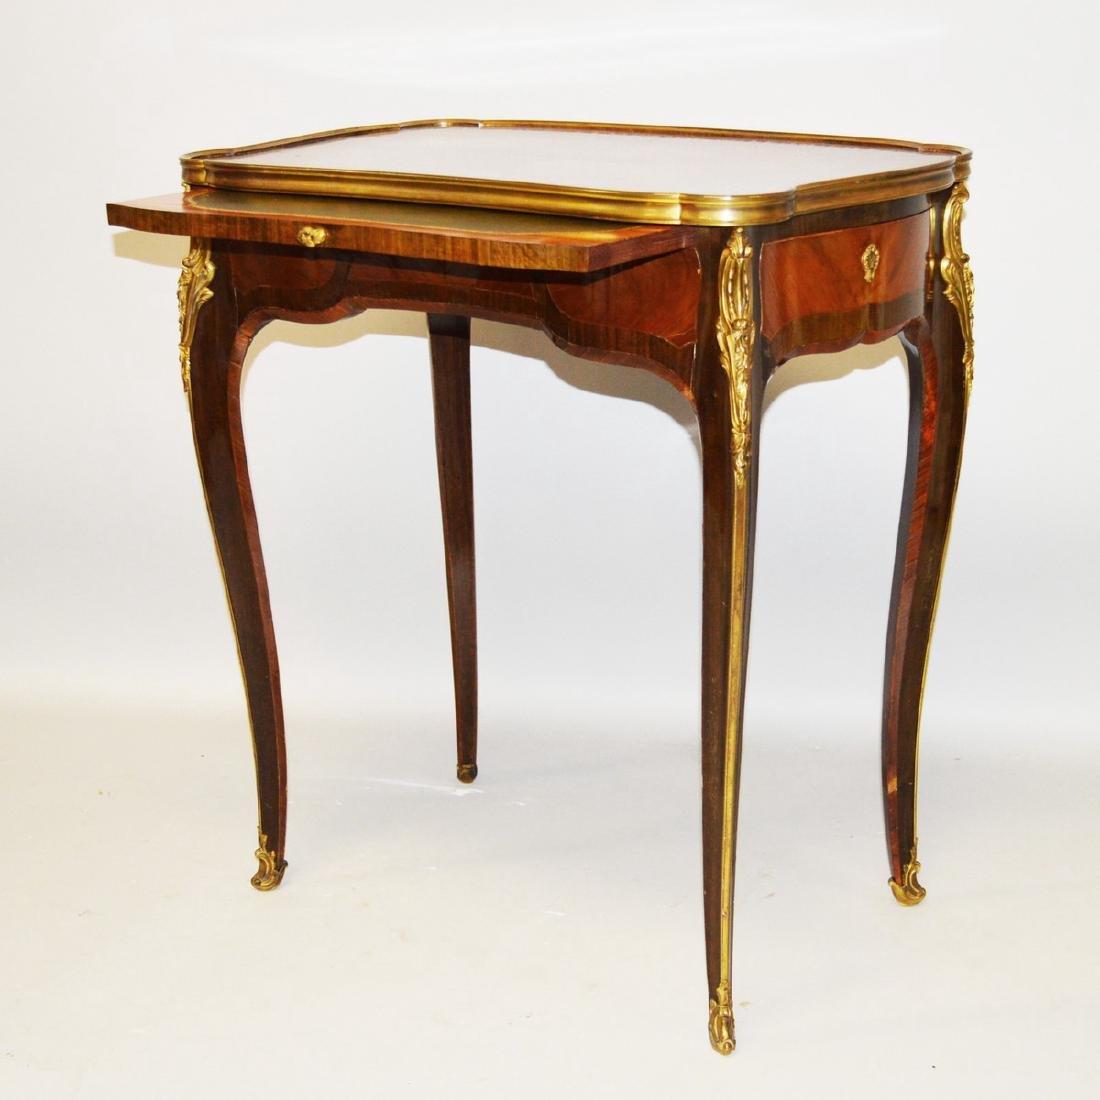 A GOOD 19TH CENTURY FRENCH LINKE MODEL SHAPED KINGWOOD